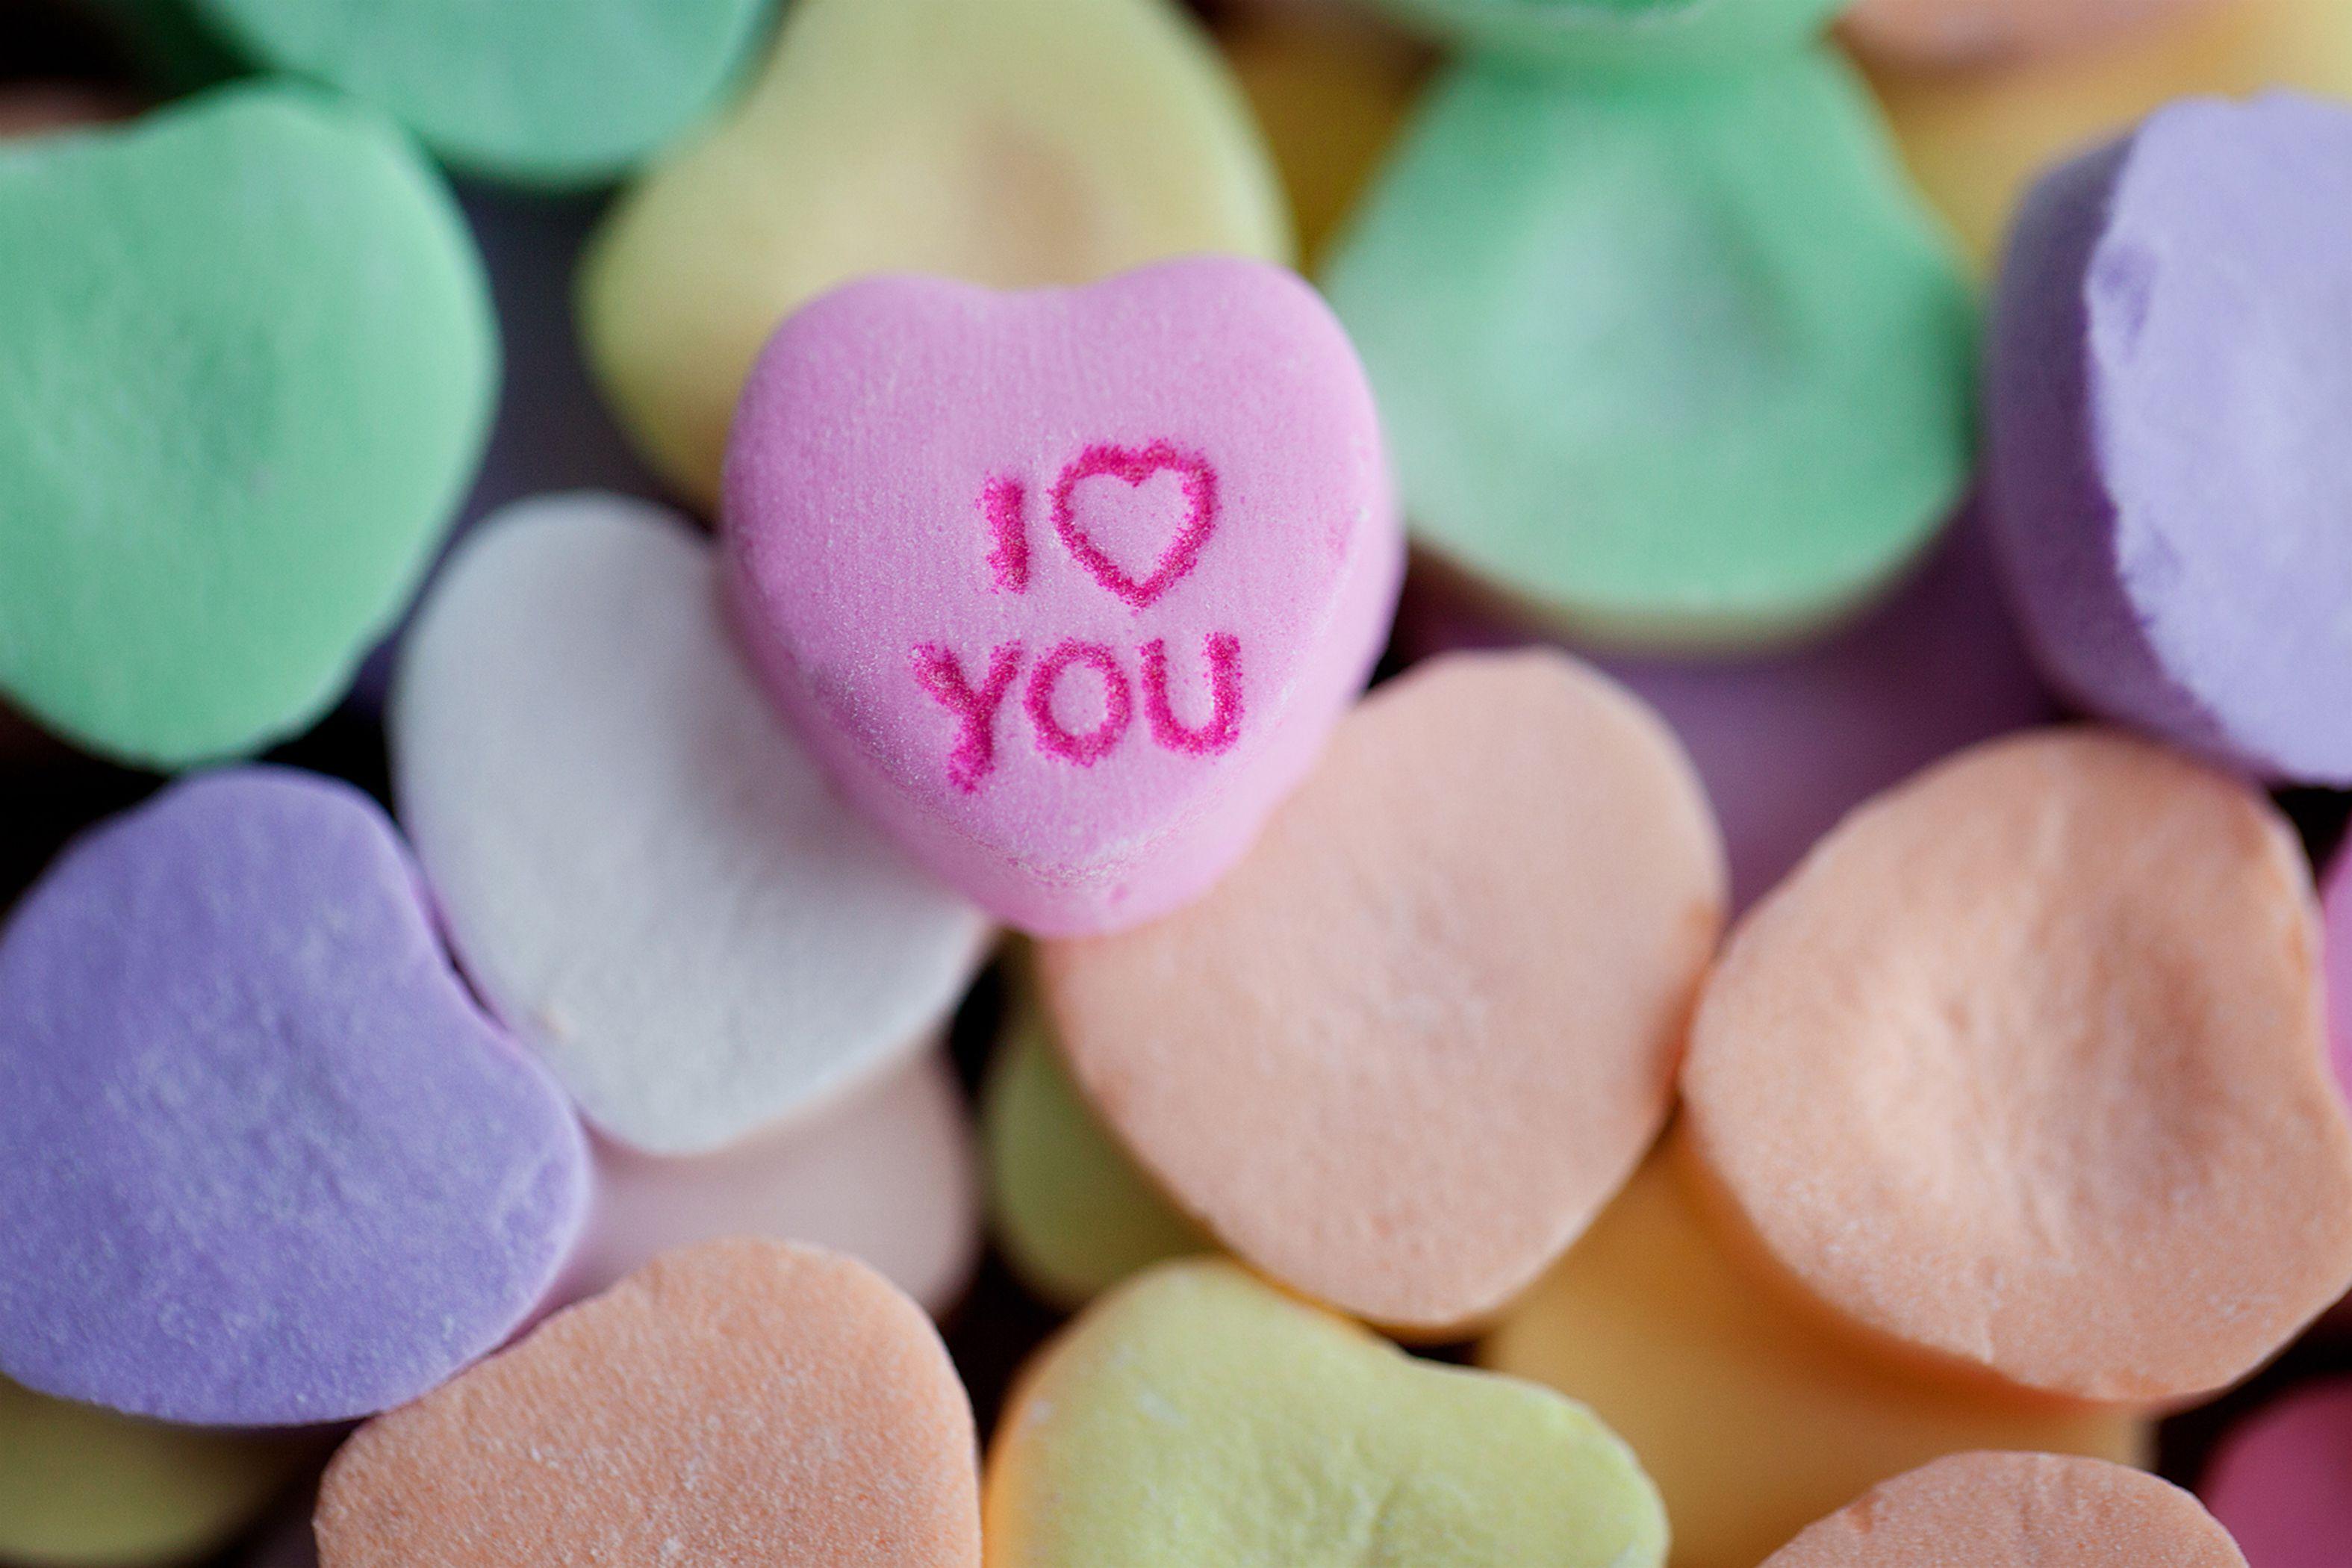 candy hearts 5a53a750b39d ecfb6